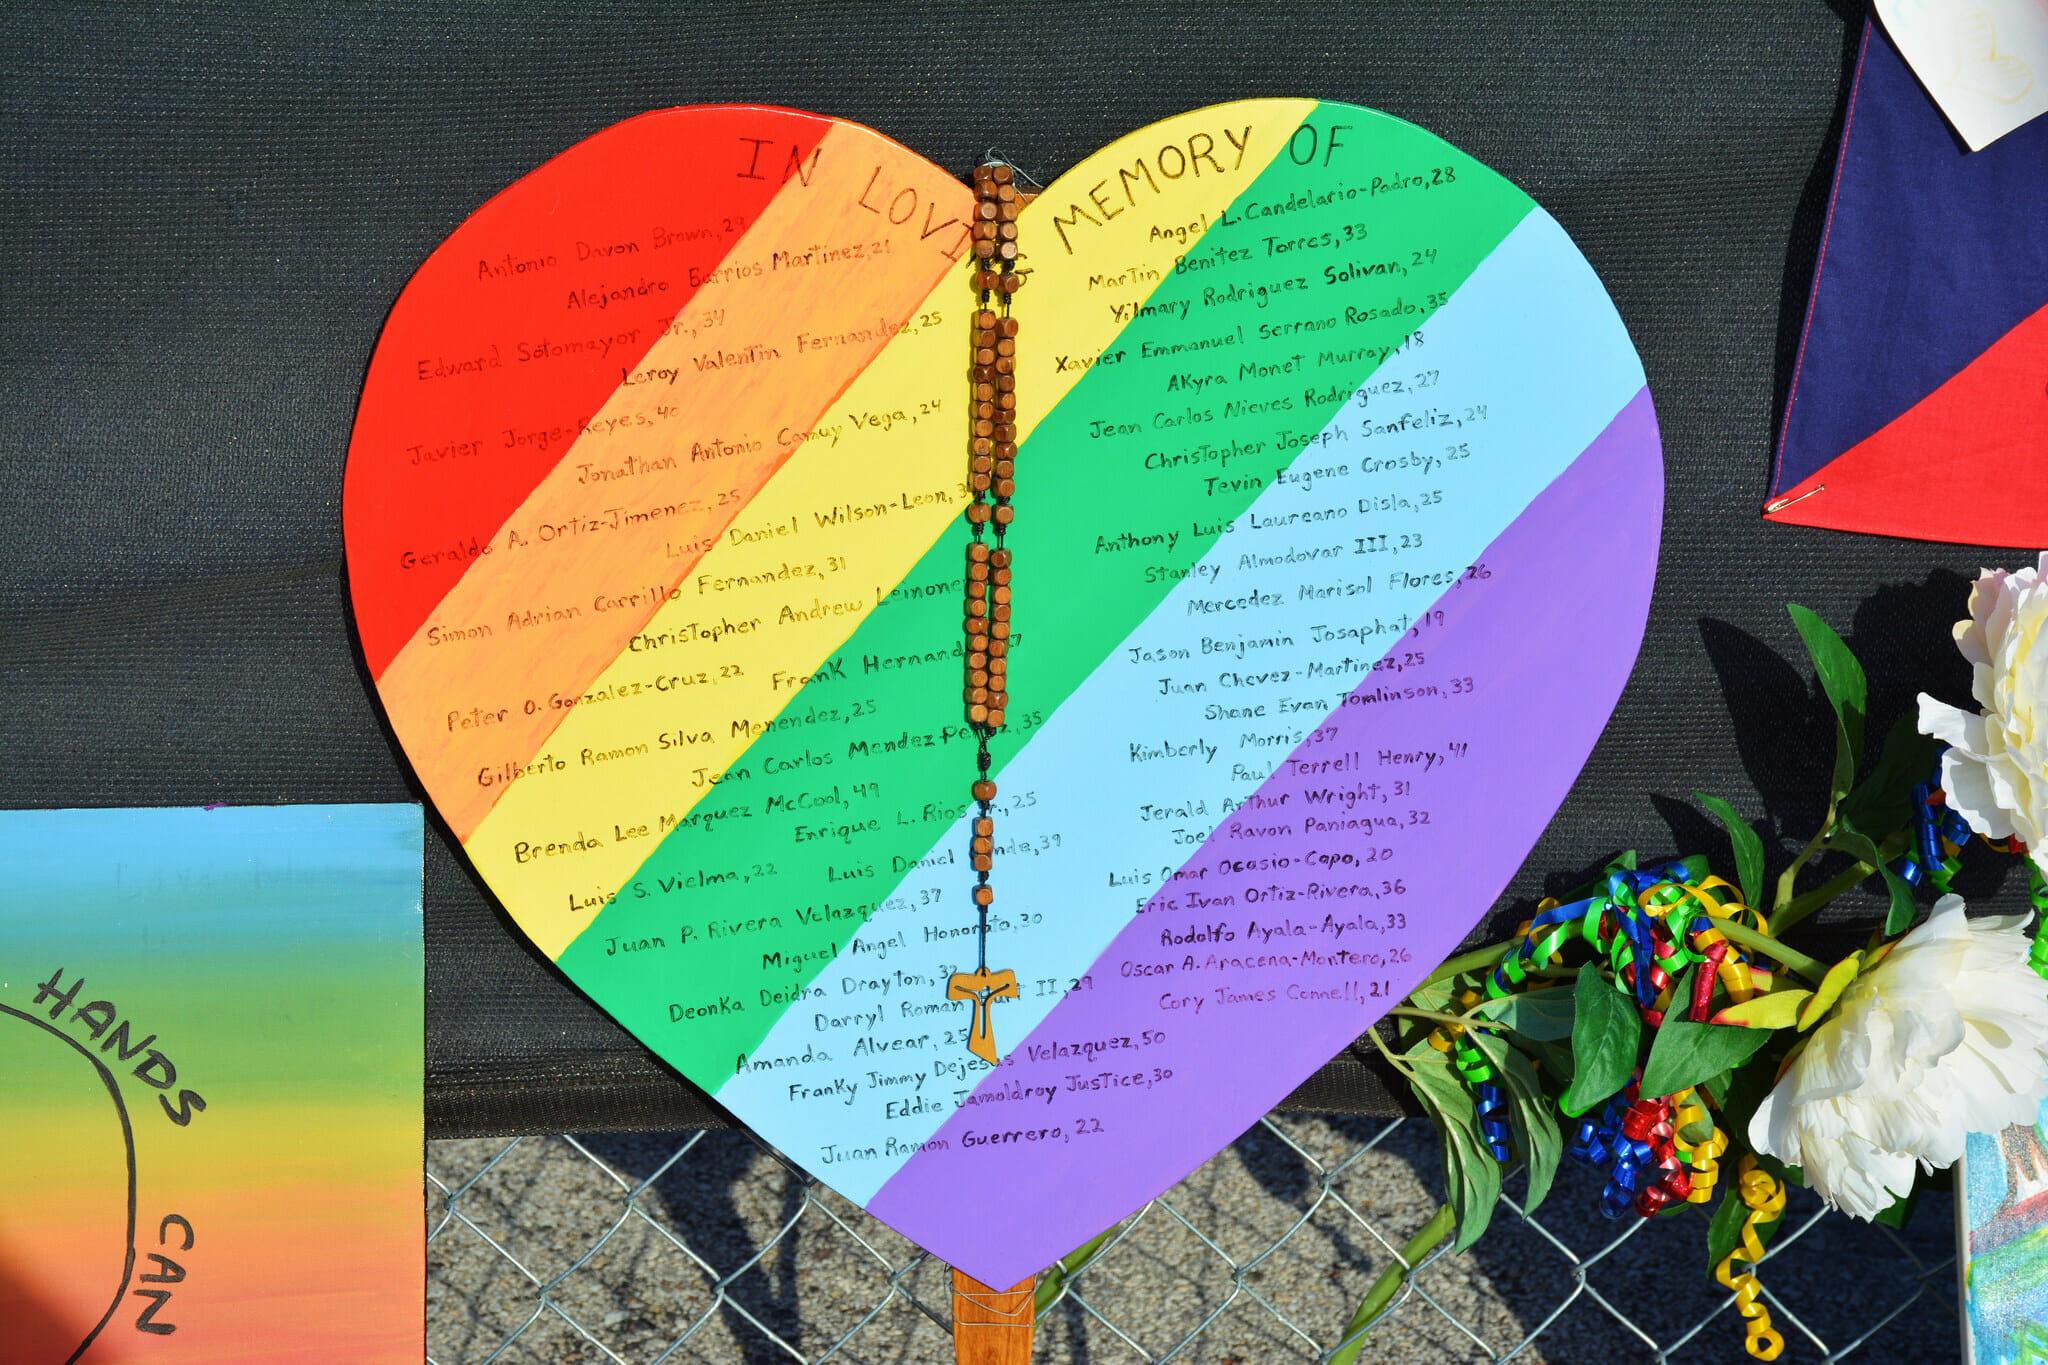 Orlando Pulse Nightclub